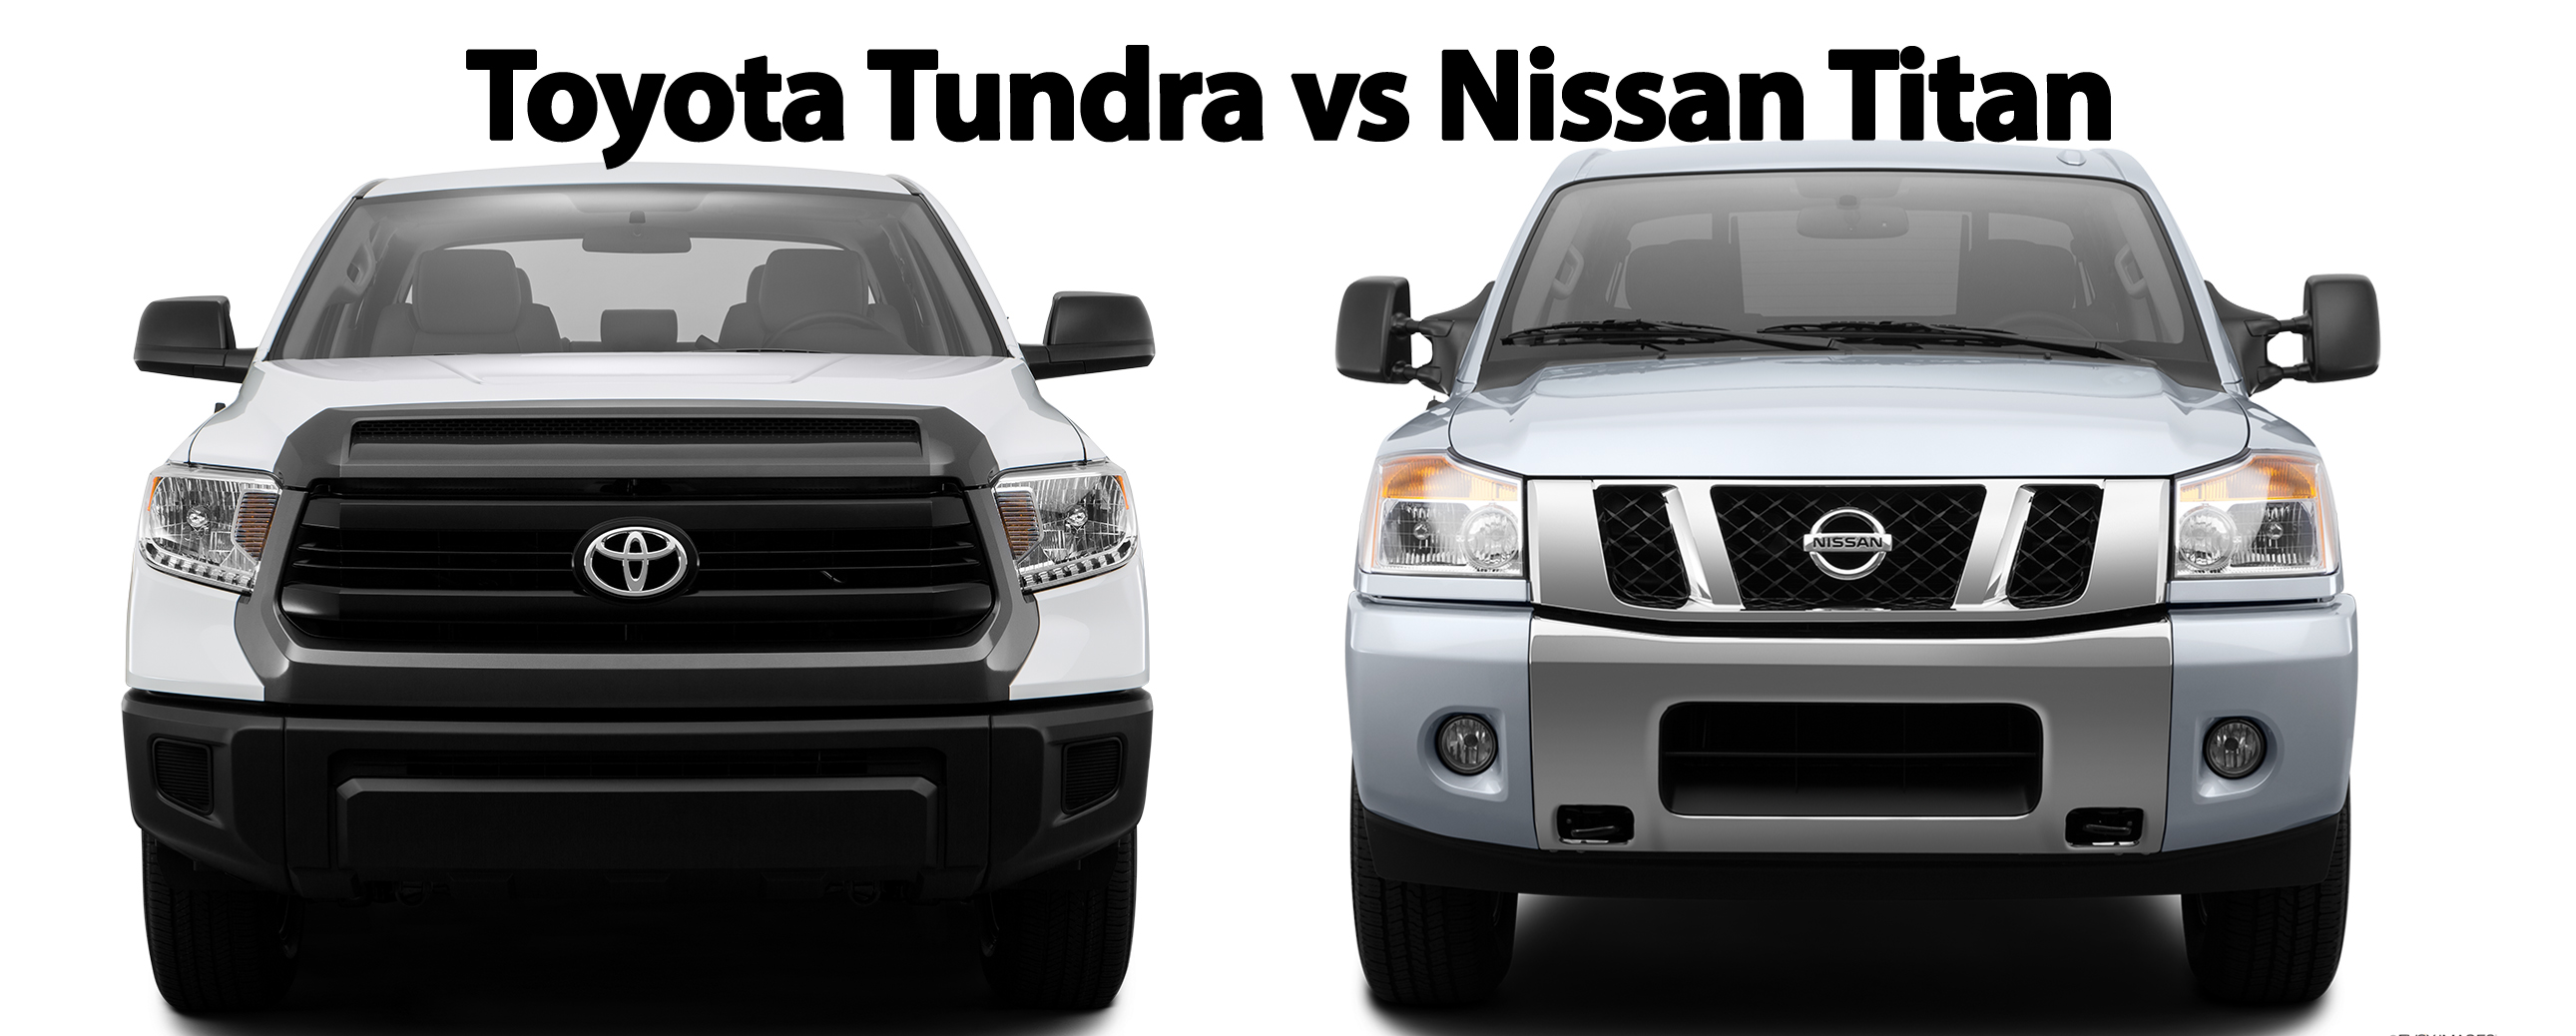 toyota tundra vs nissan titan toyota of ardmore. Black Bedroom Furniture Sets. Home Design Ideas